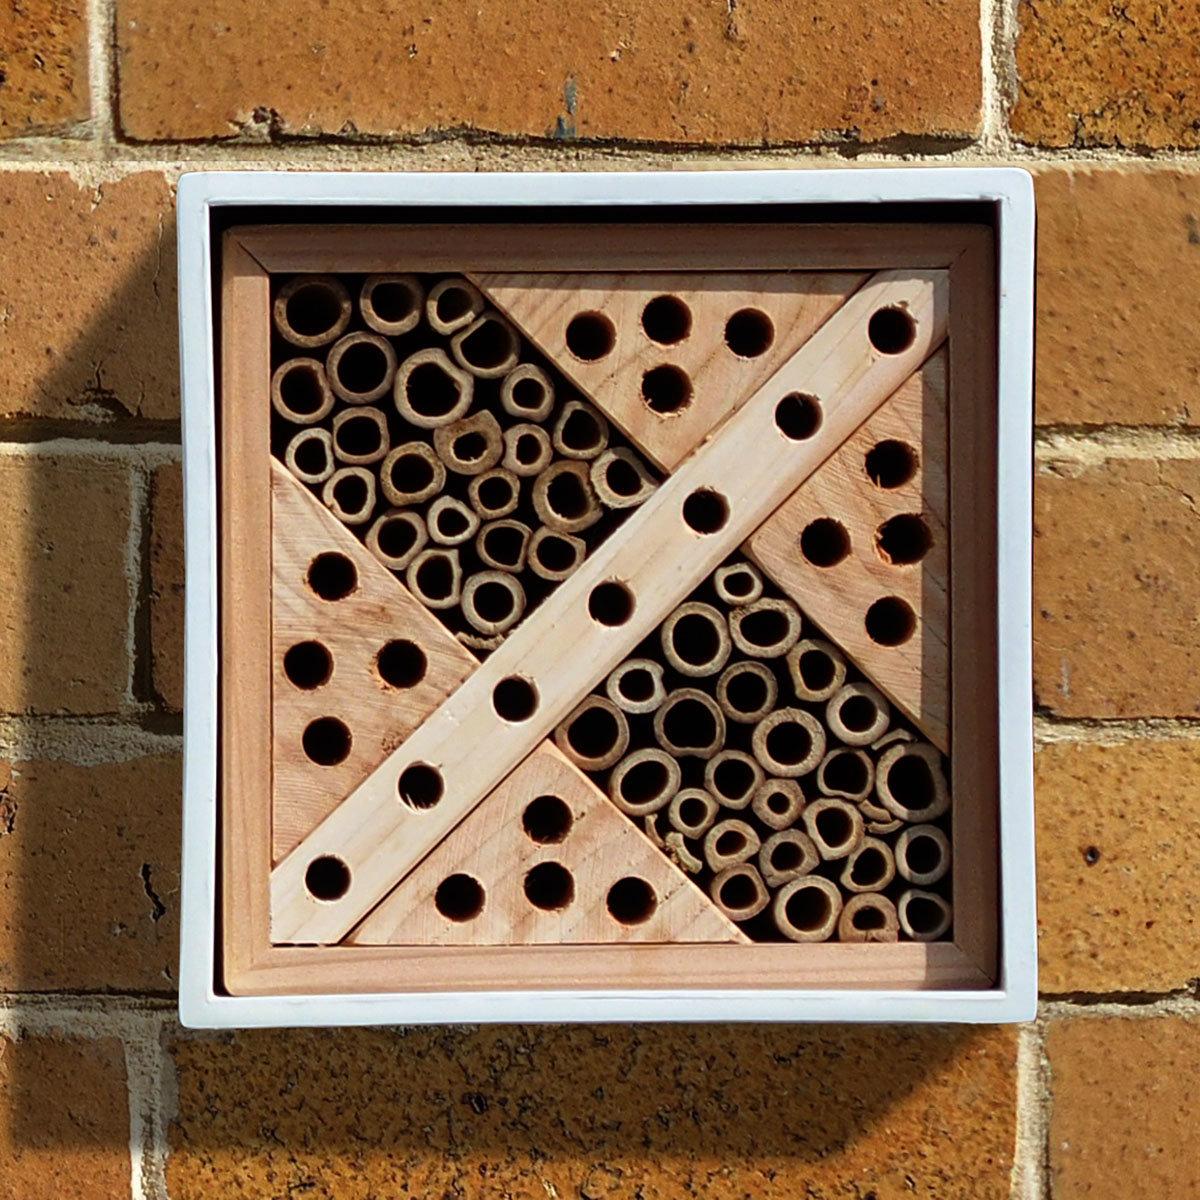 Bienenhotel Urban Design | #2